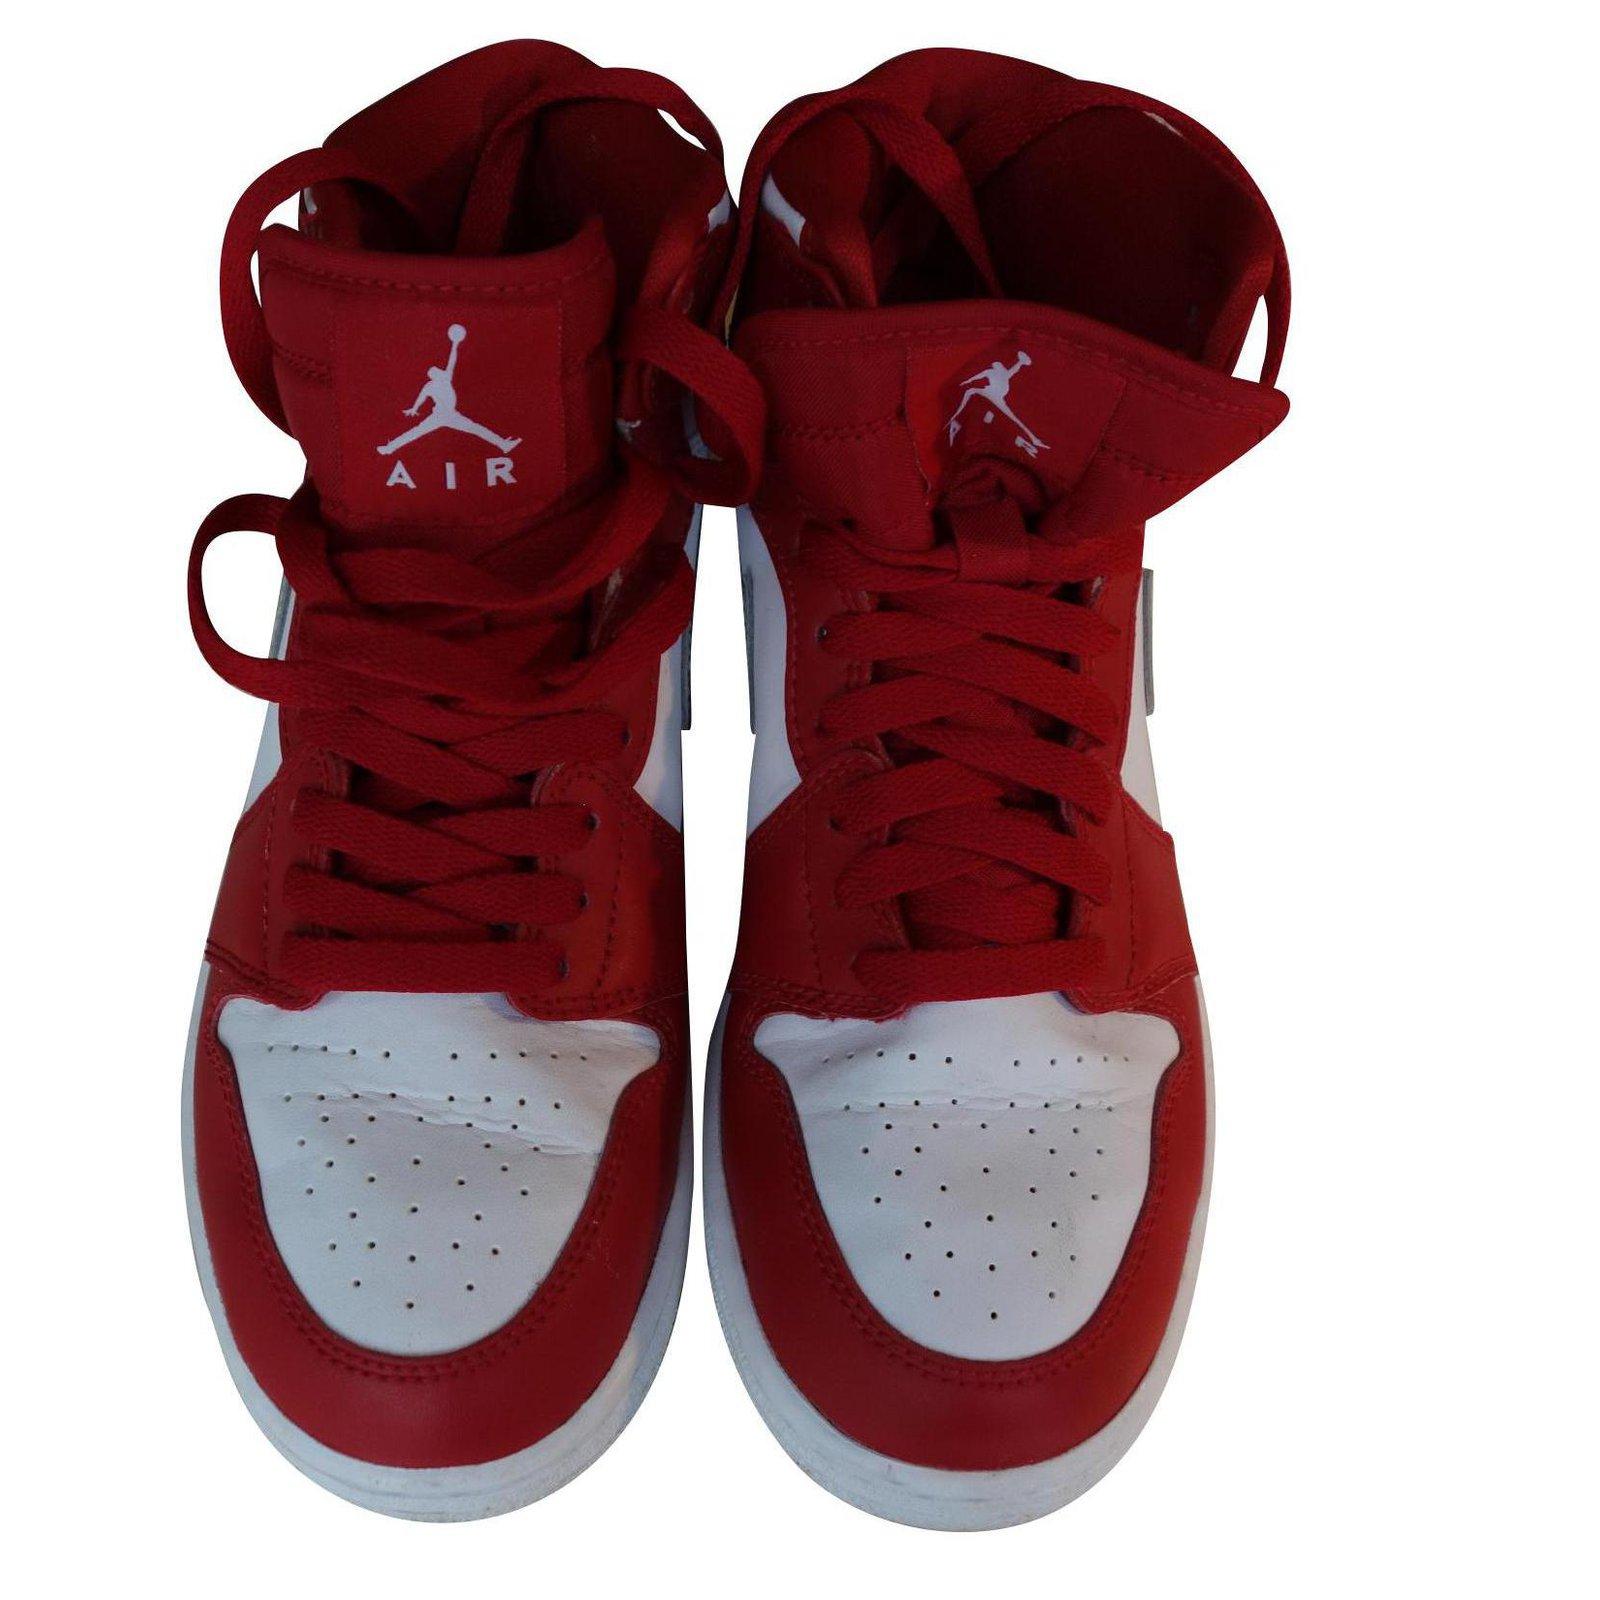 Nike Air Jordan 1 Retro High Red Leather ref.115184 - Joli Closet